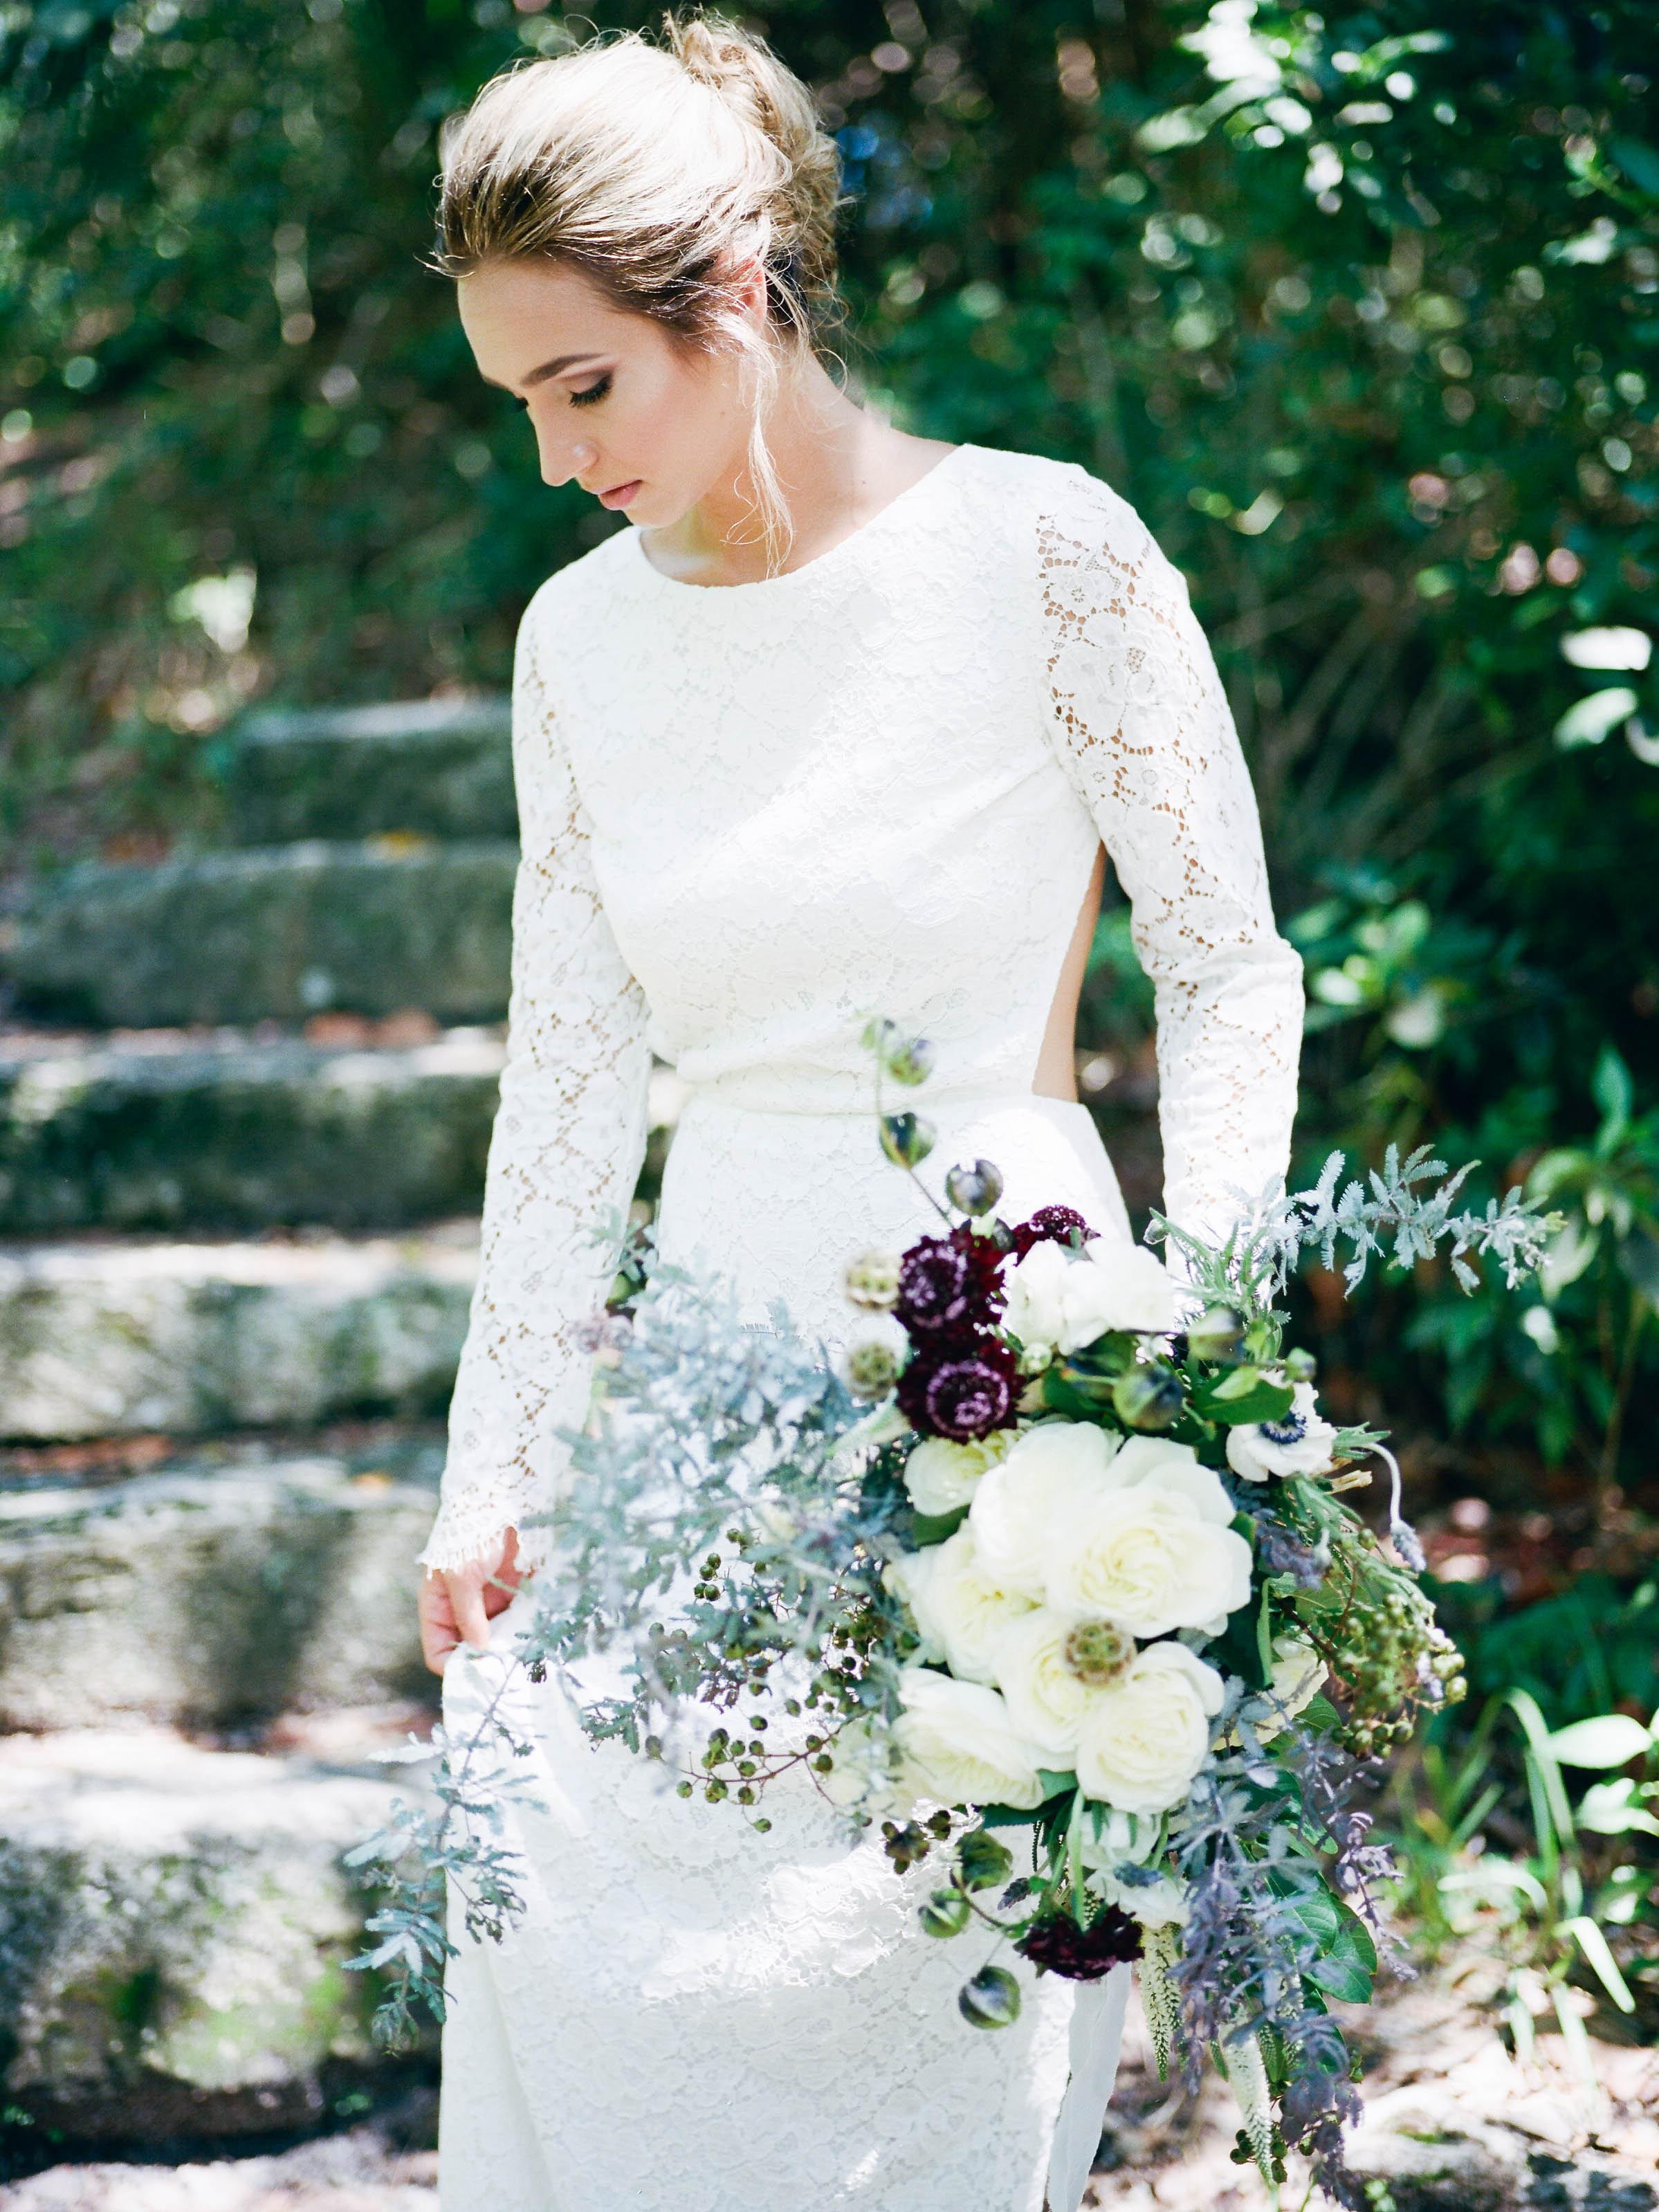 REGreynoldsPark-EdellePhotography-WeddingPhotographer-135.jpg